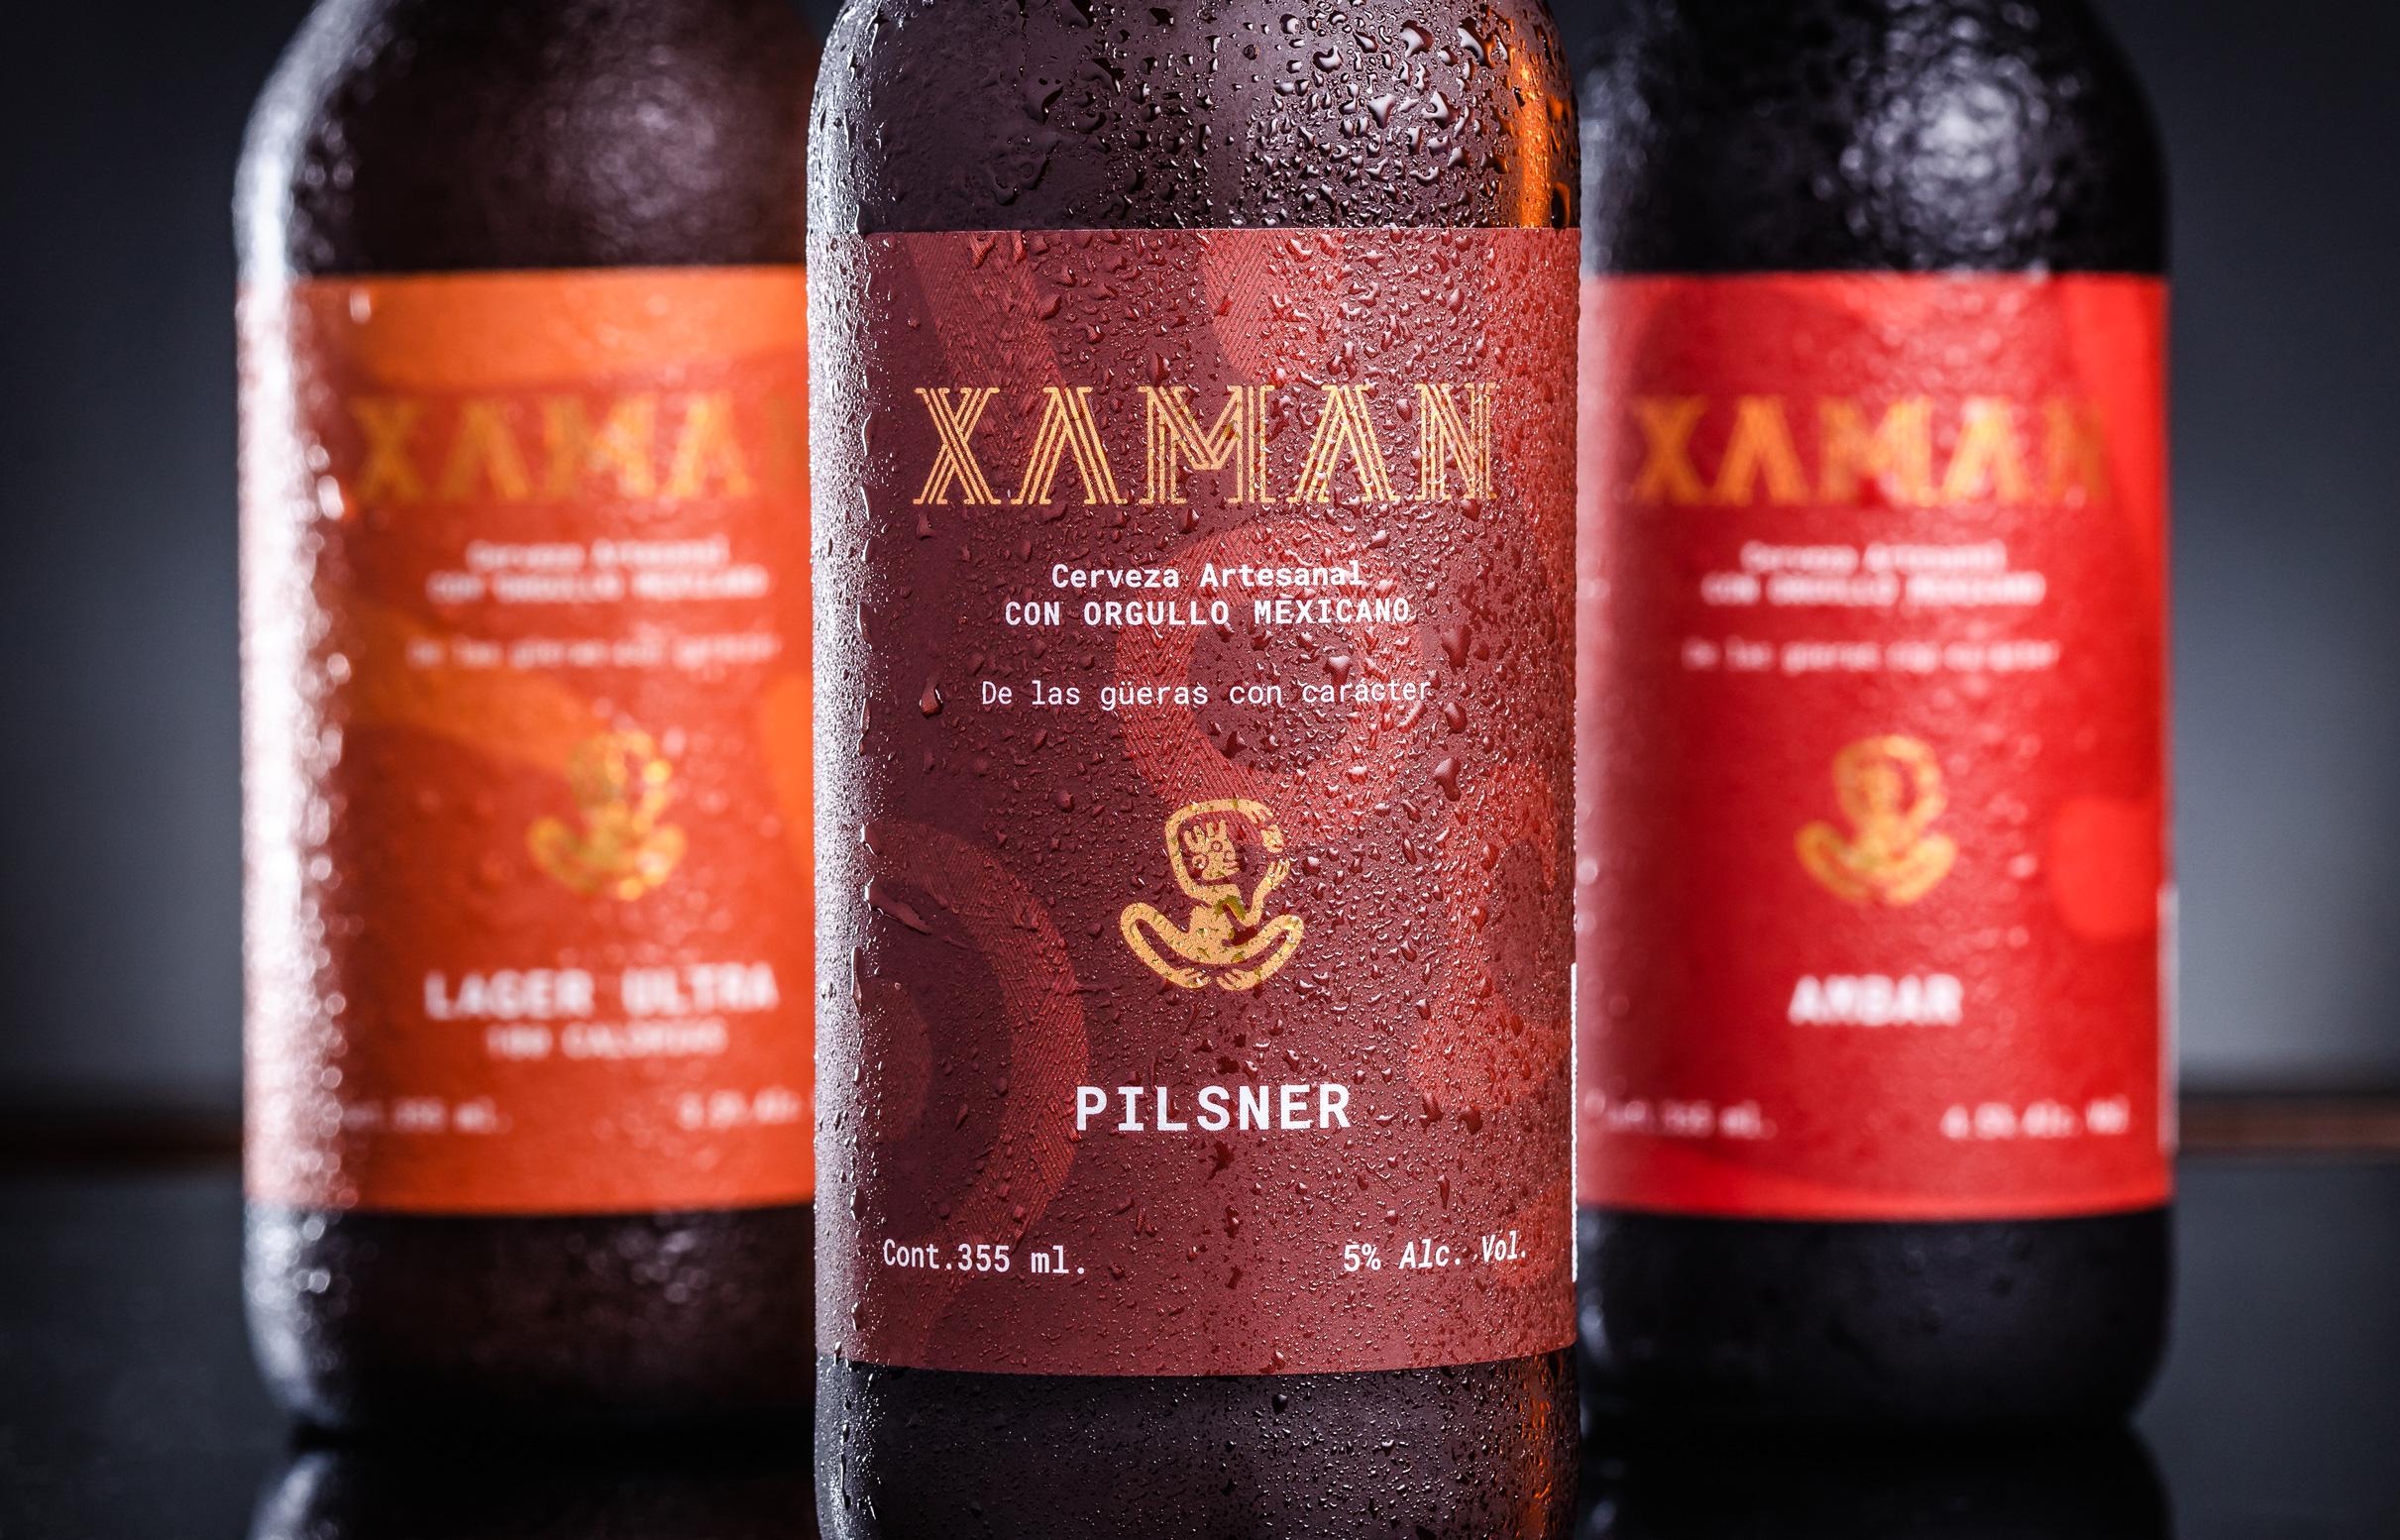 Xaman Beer Branding Designed by by Estudio Manila